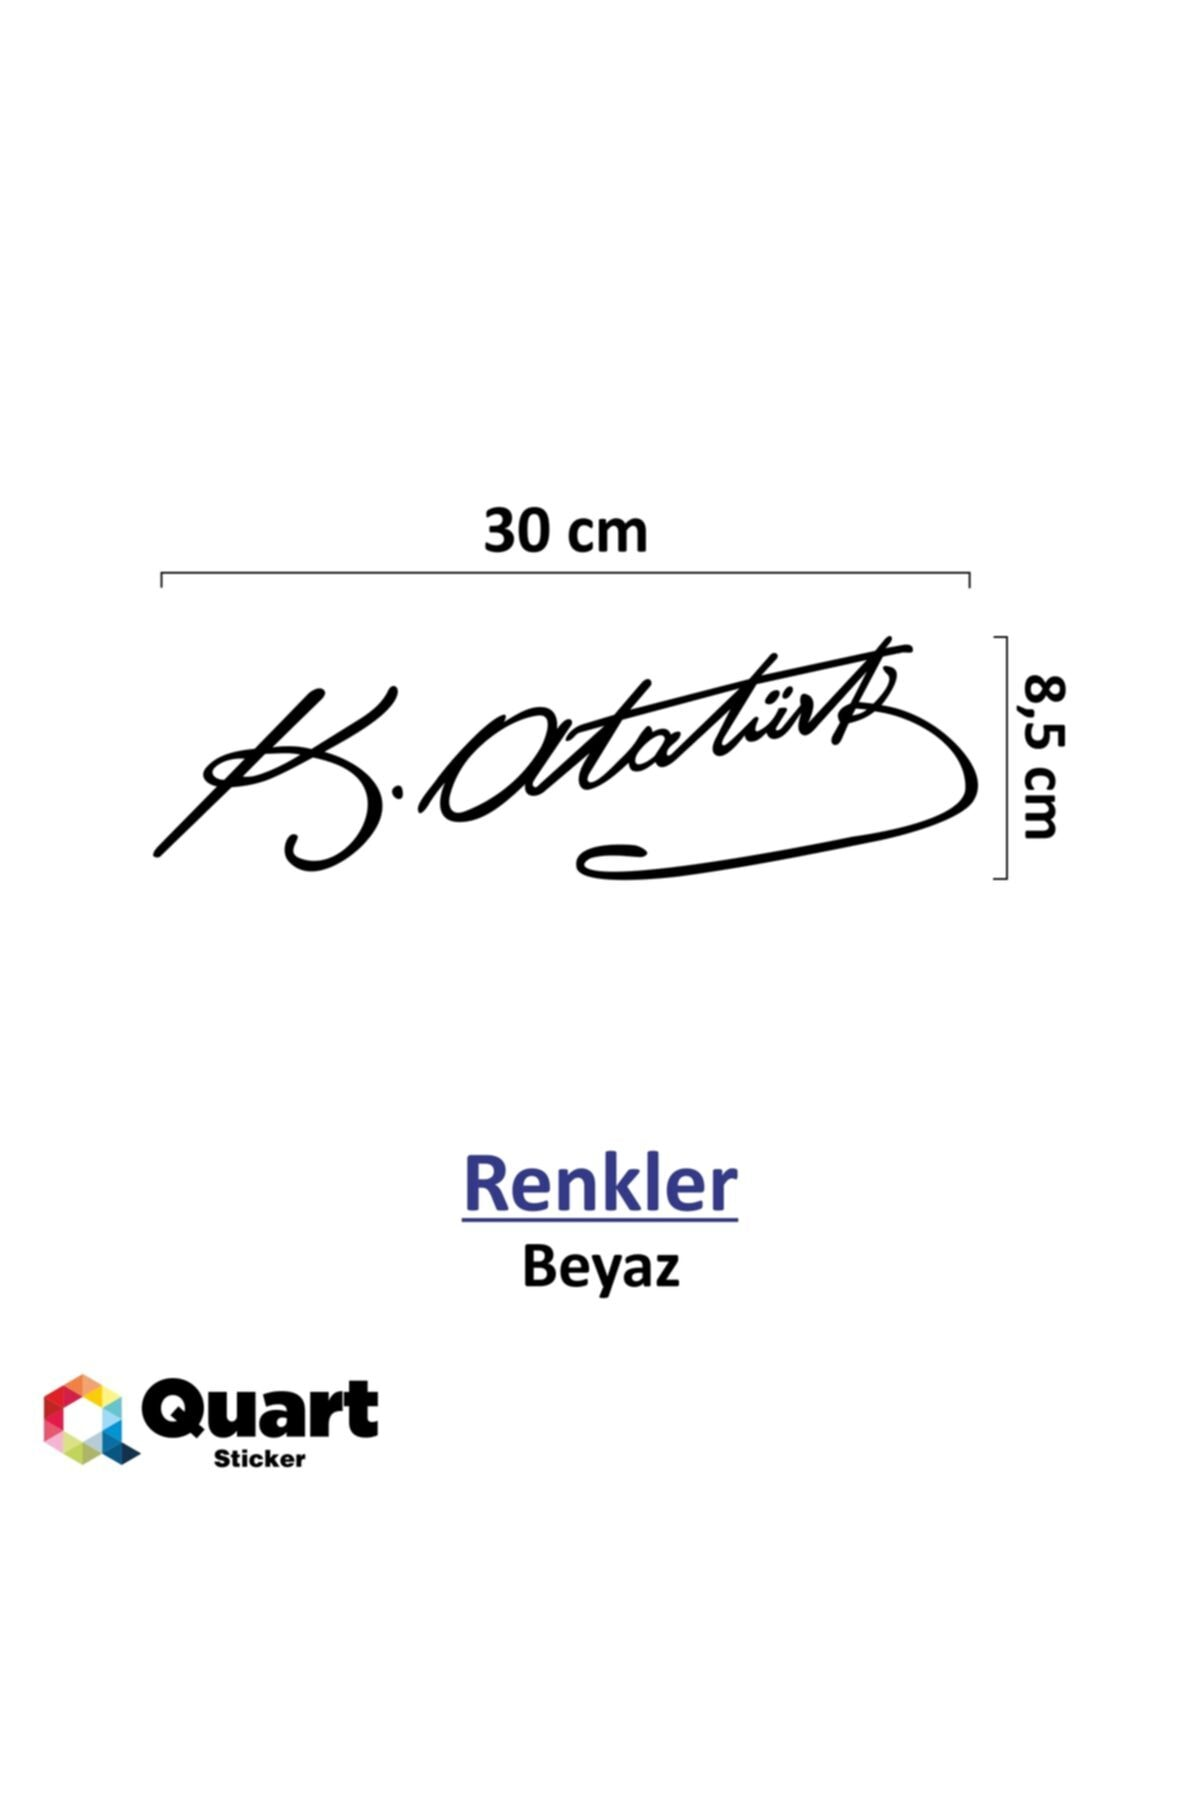 Quart Aksesuar Beyaz 30 Cm Kemal Atatürk Imza Sticker Araba, Oto Araç Sticker 2